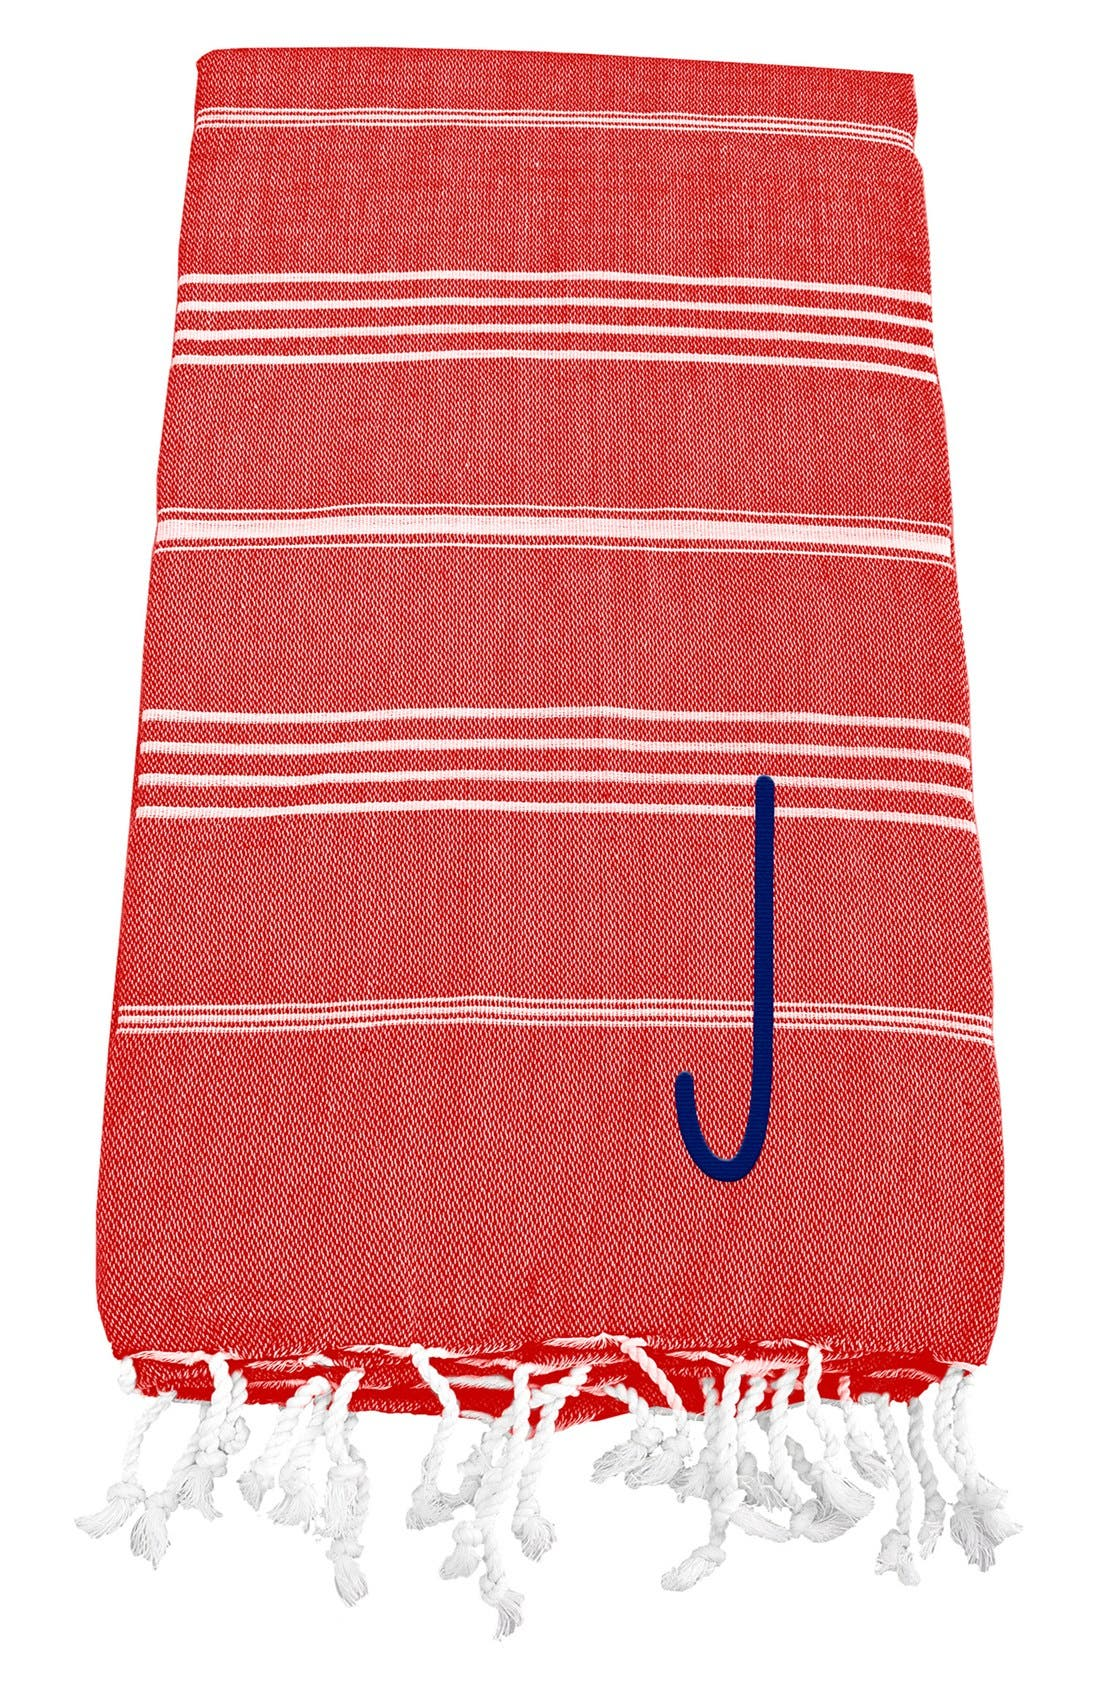 Monogram Turkish Cotton Towel,                             Main thumbnail 119, color,